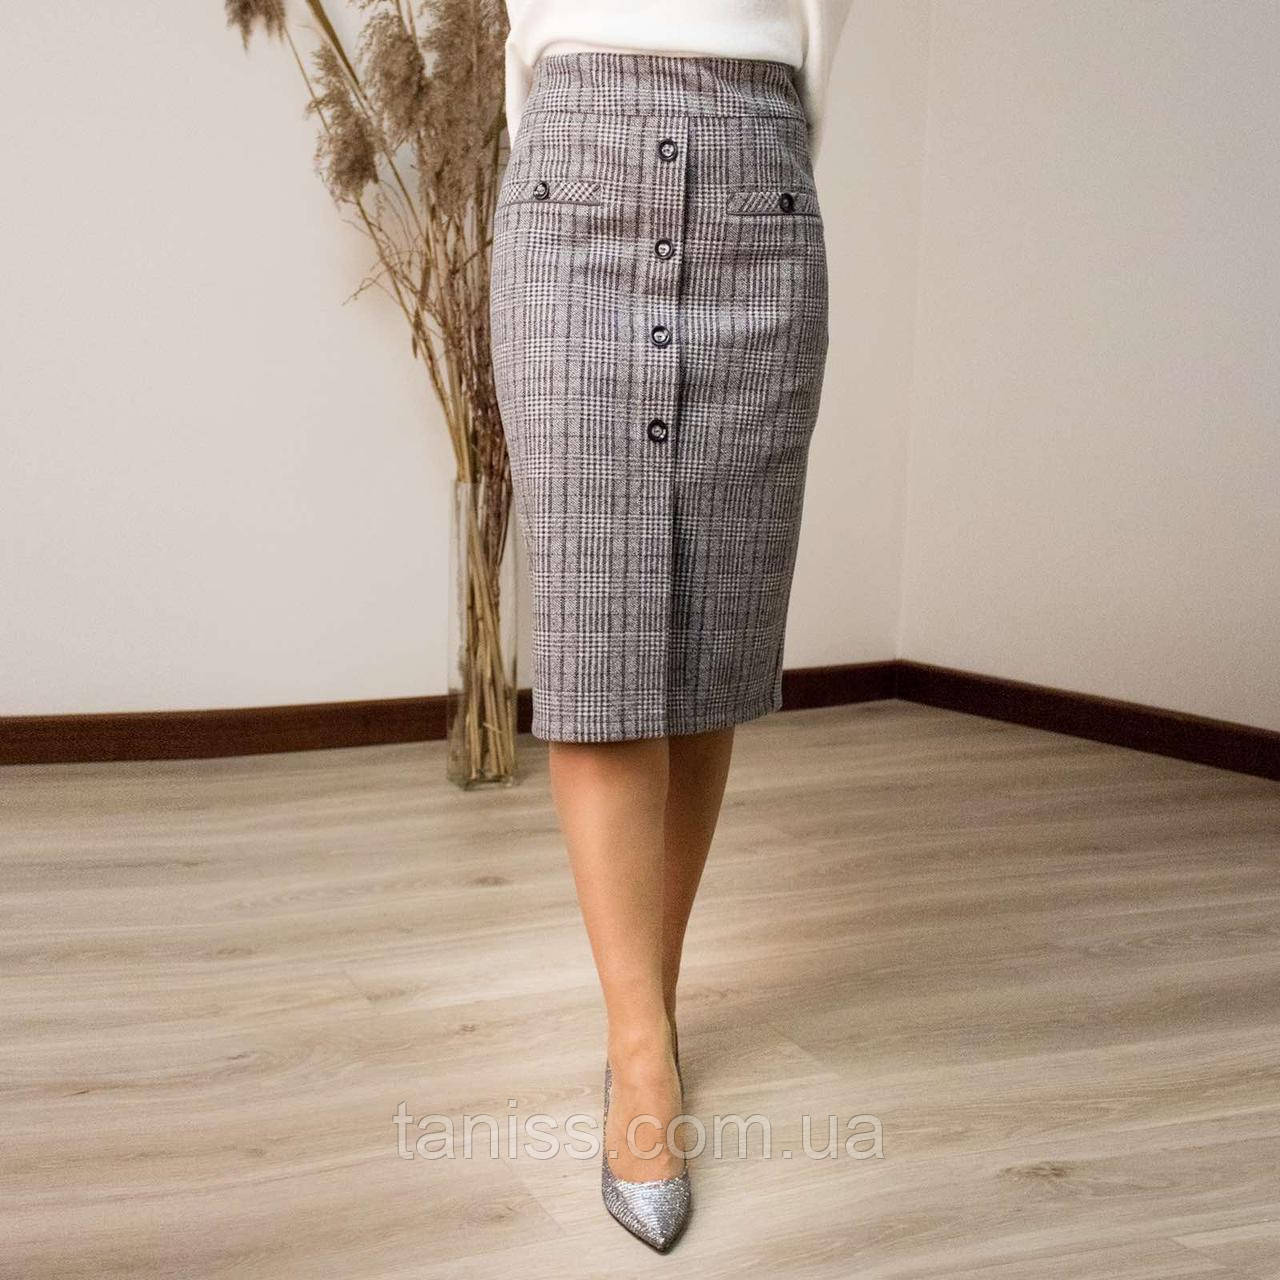 "Женская  стильная юбка на пуговица ""Летисия"",ткань теплый трикотаж, р-р 46,48,50,52,54,56,58, клетка, спідниця"